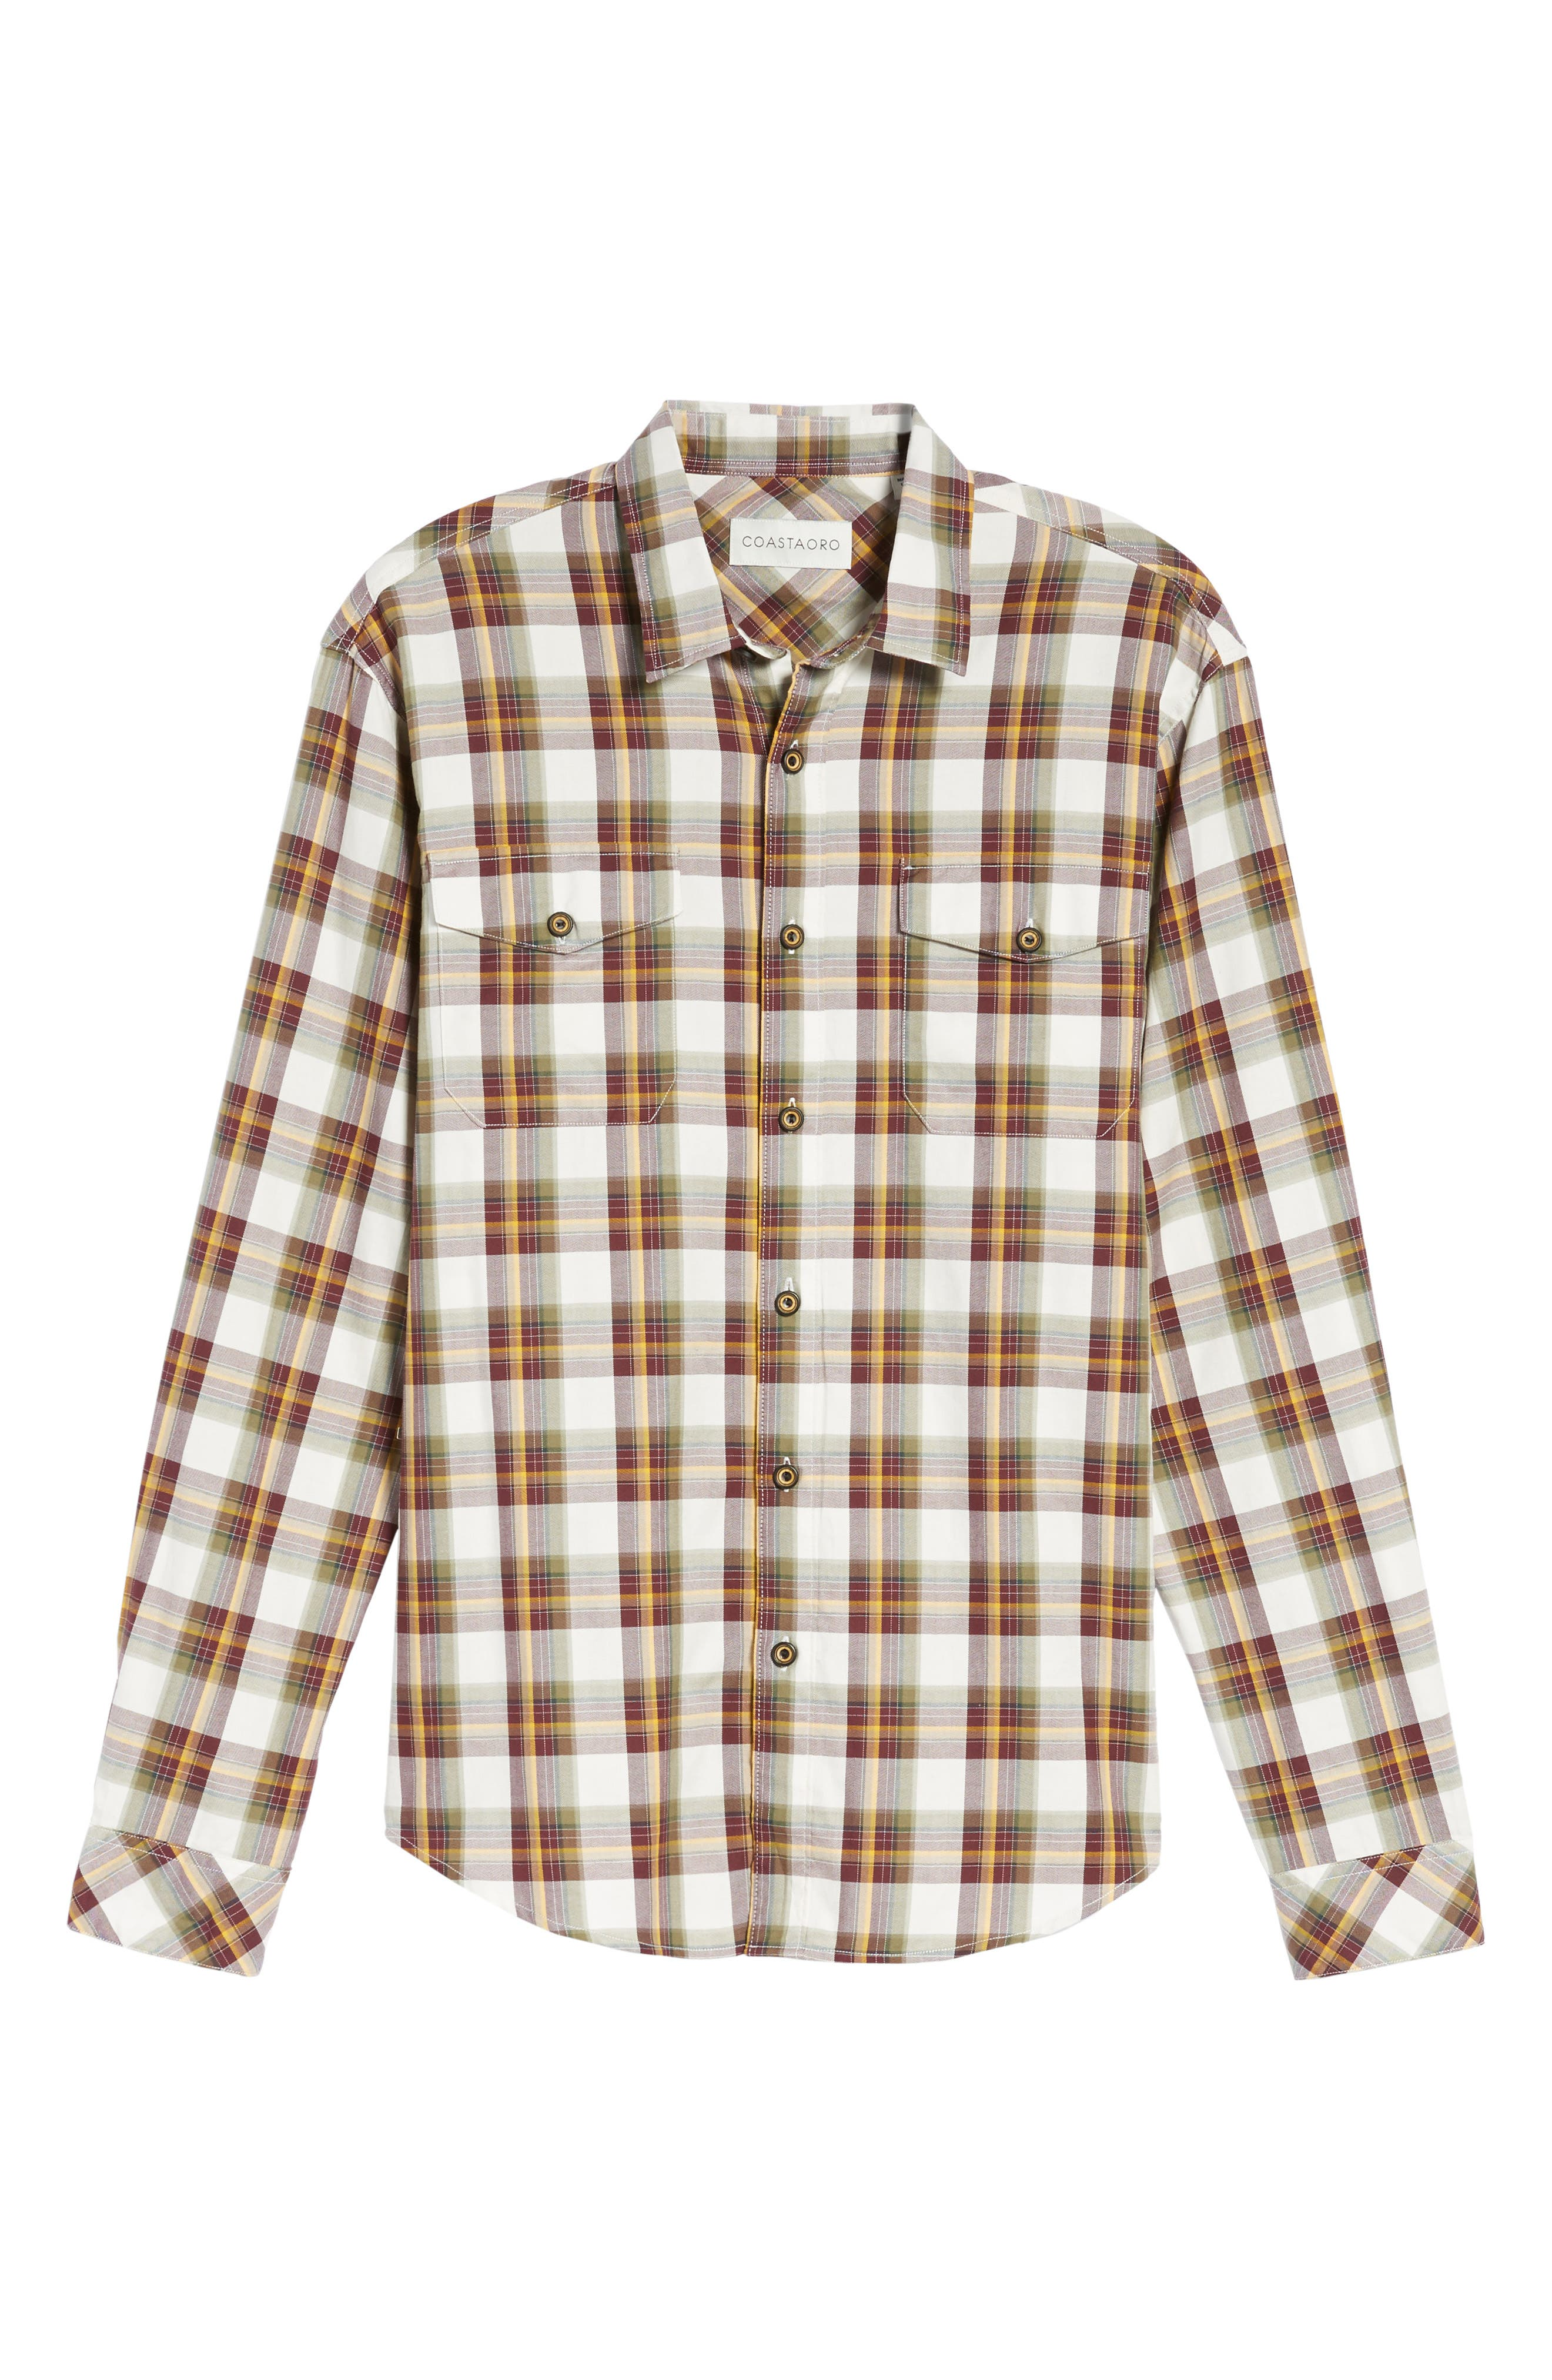 Seacliff Plaid Flannel Shirt,                             Alternate thumbnail 12, color,